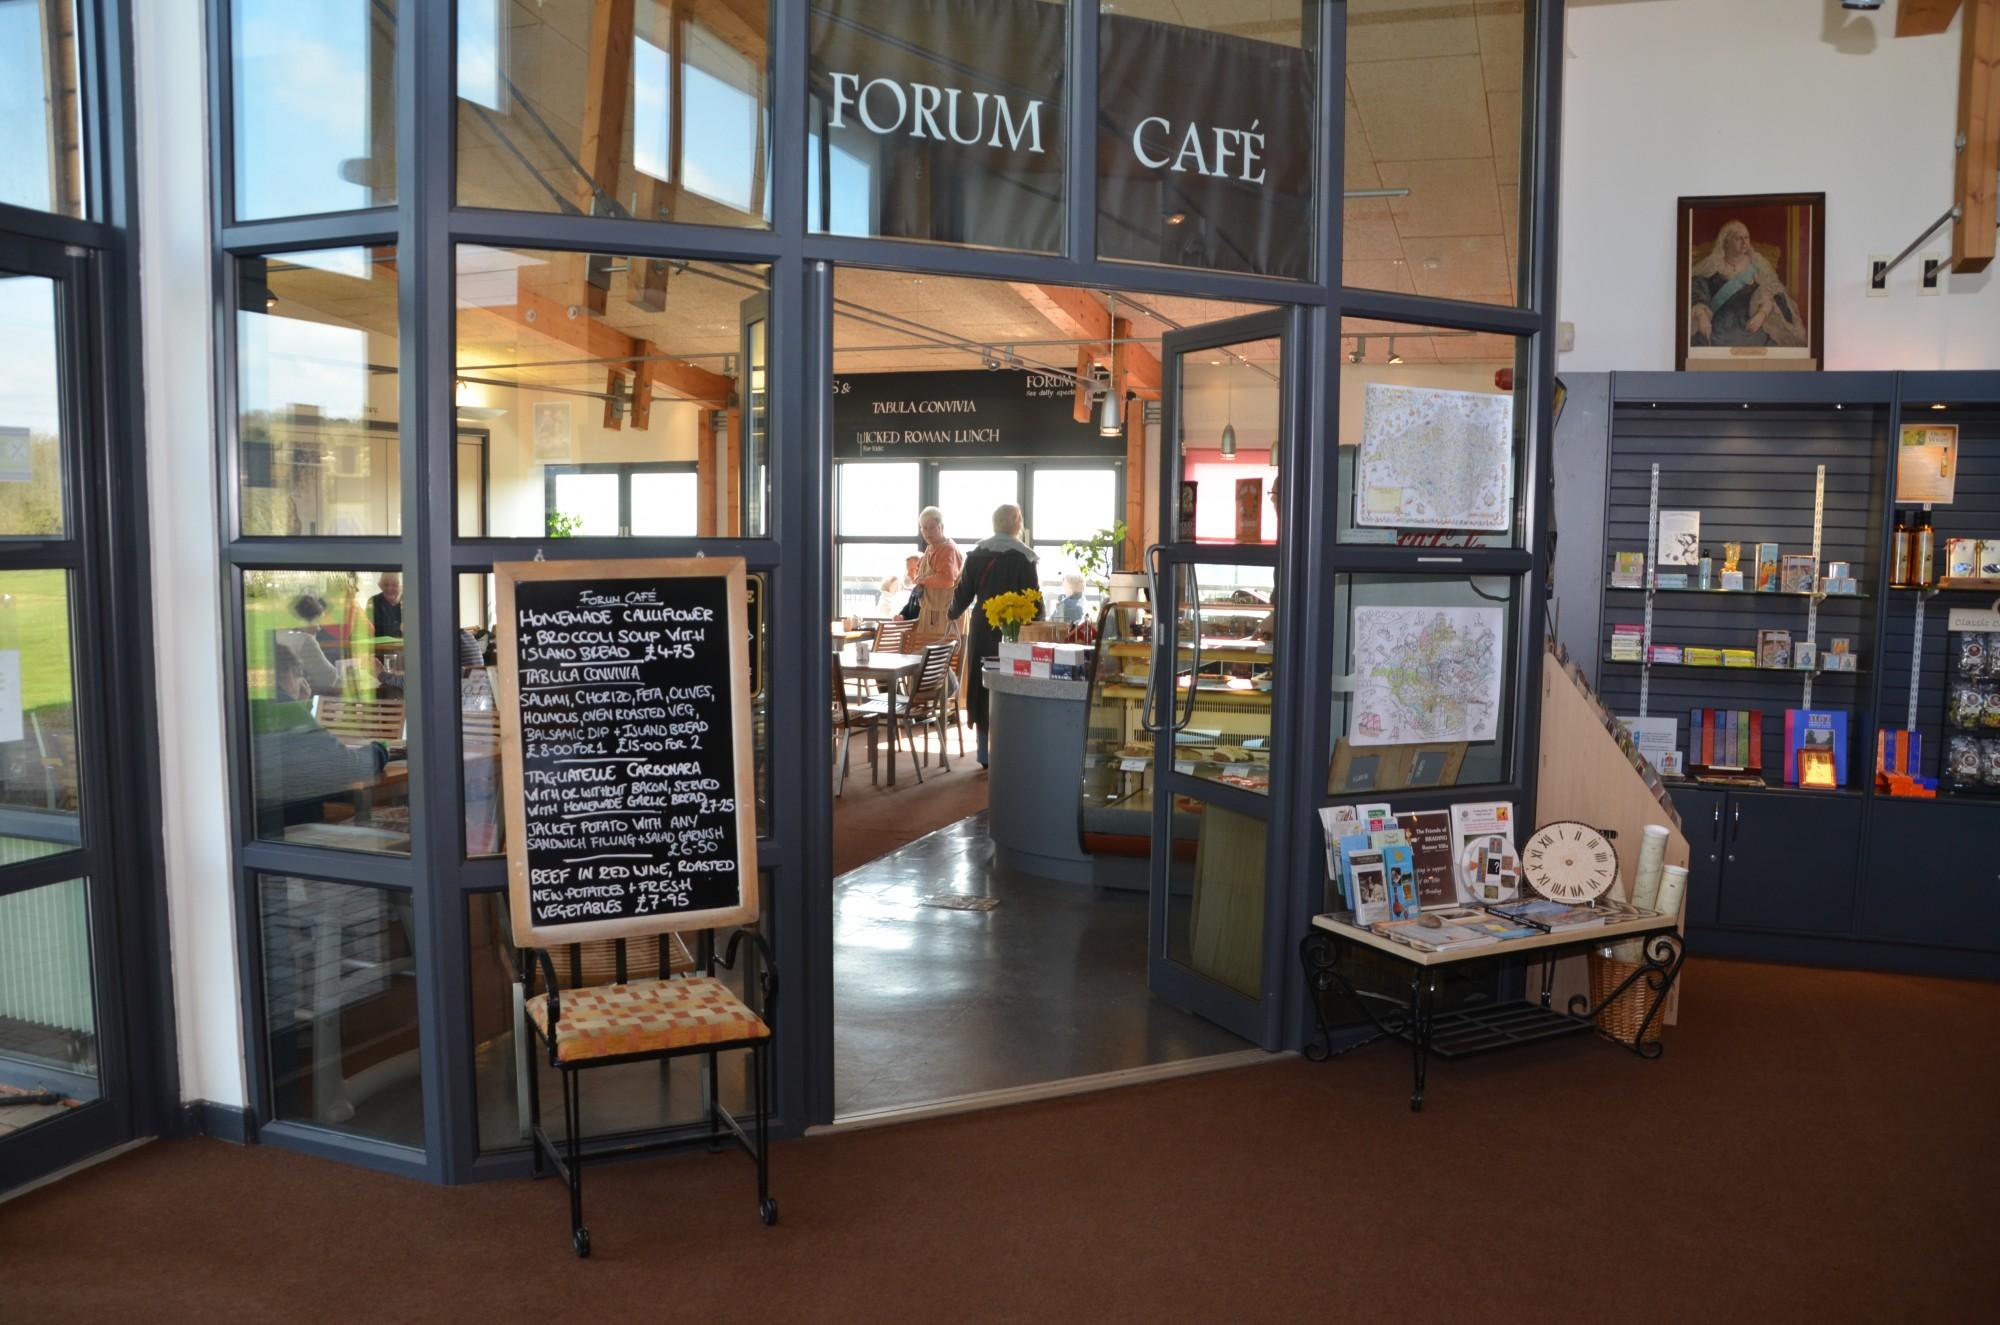 Forum Cafe Brading Roman Villa - May 2013 Tim Addison